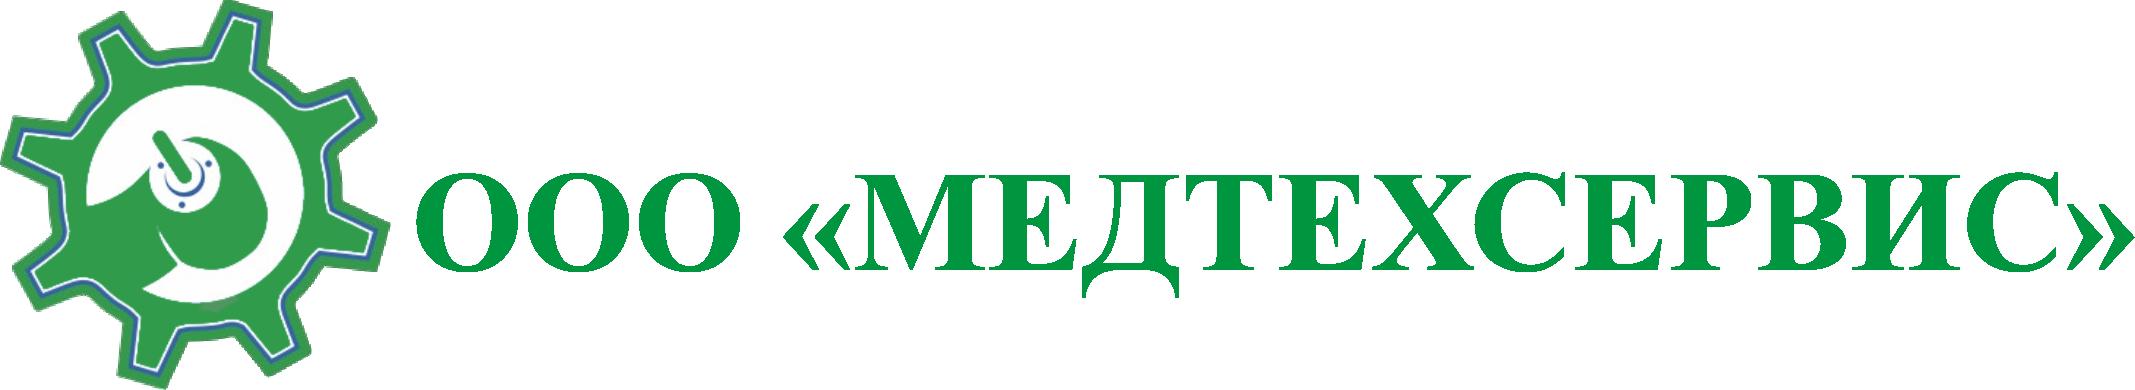 МедТехСервис